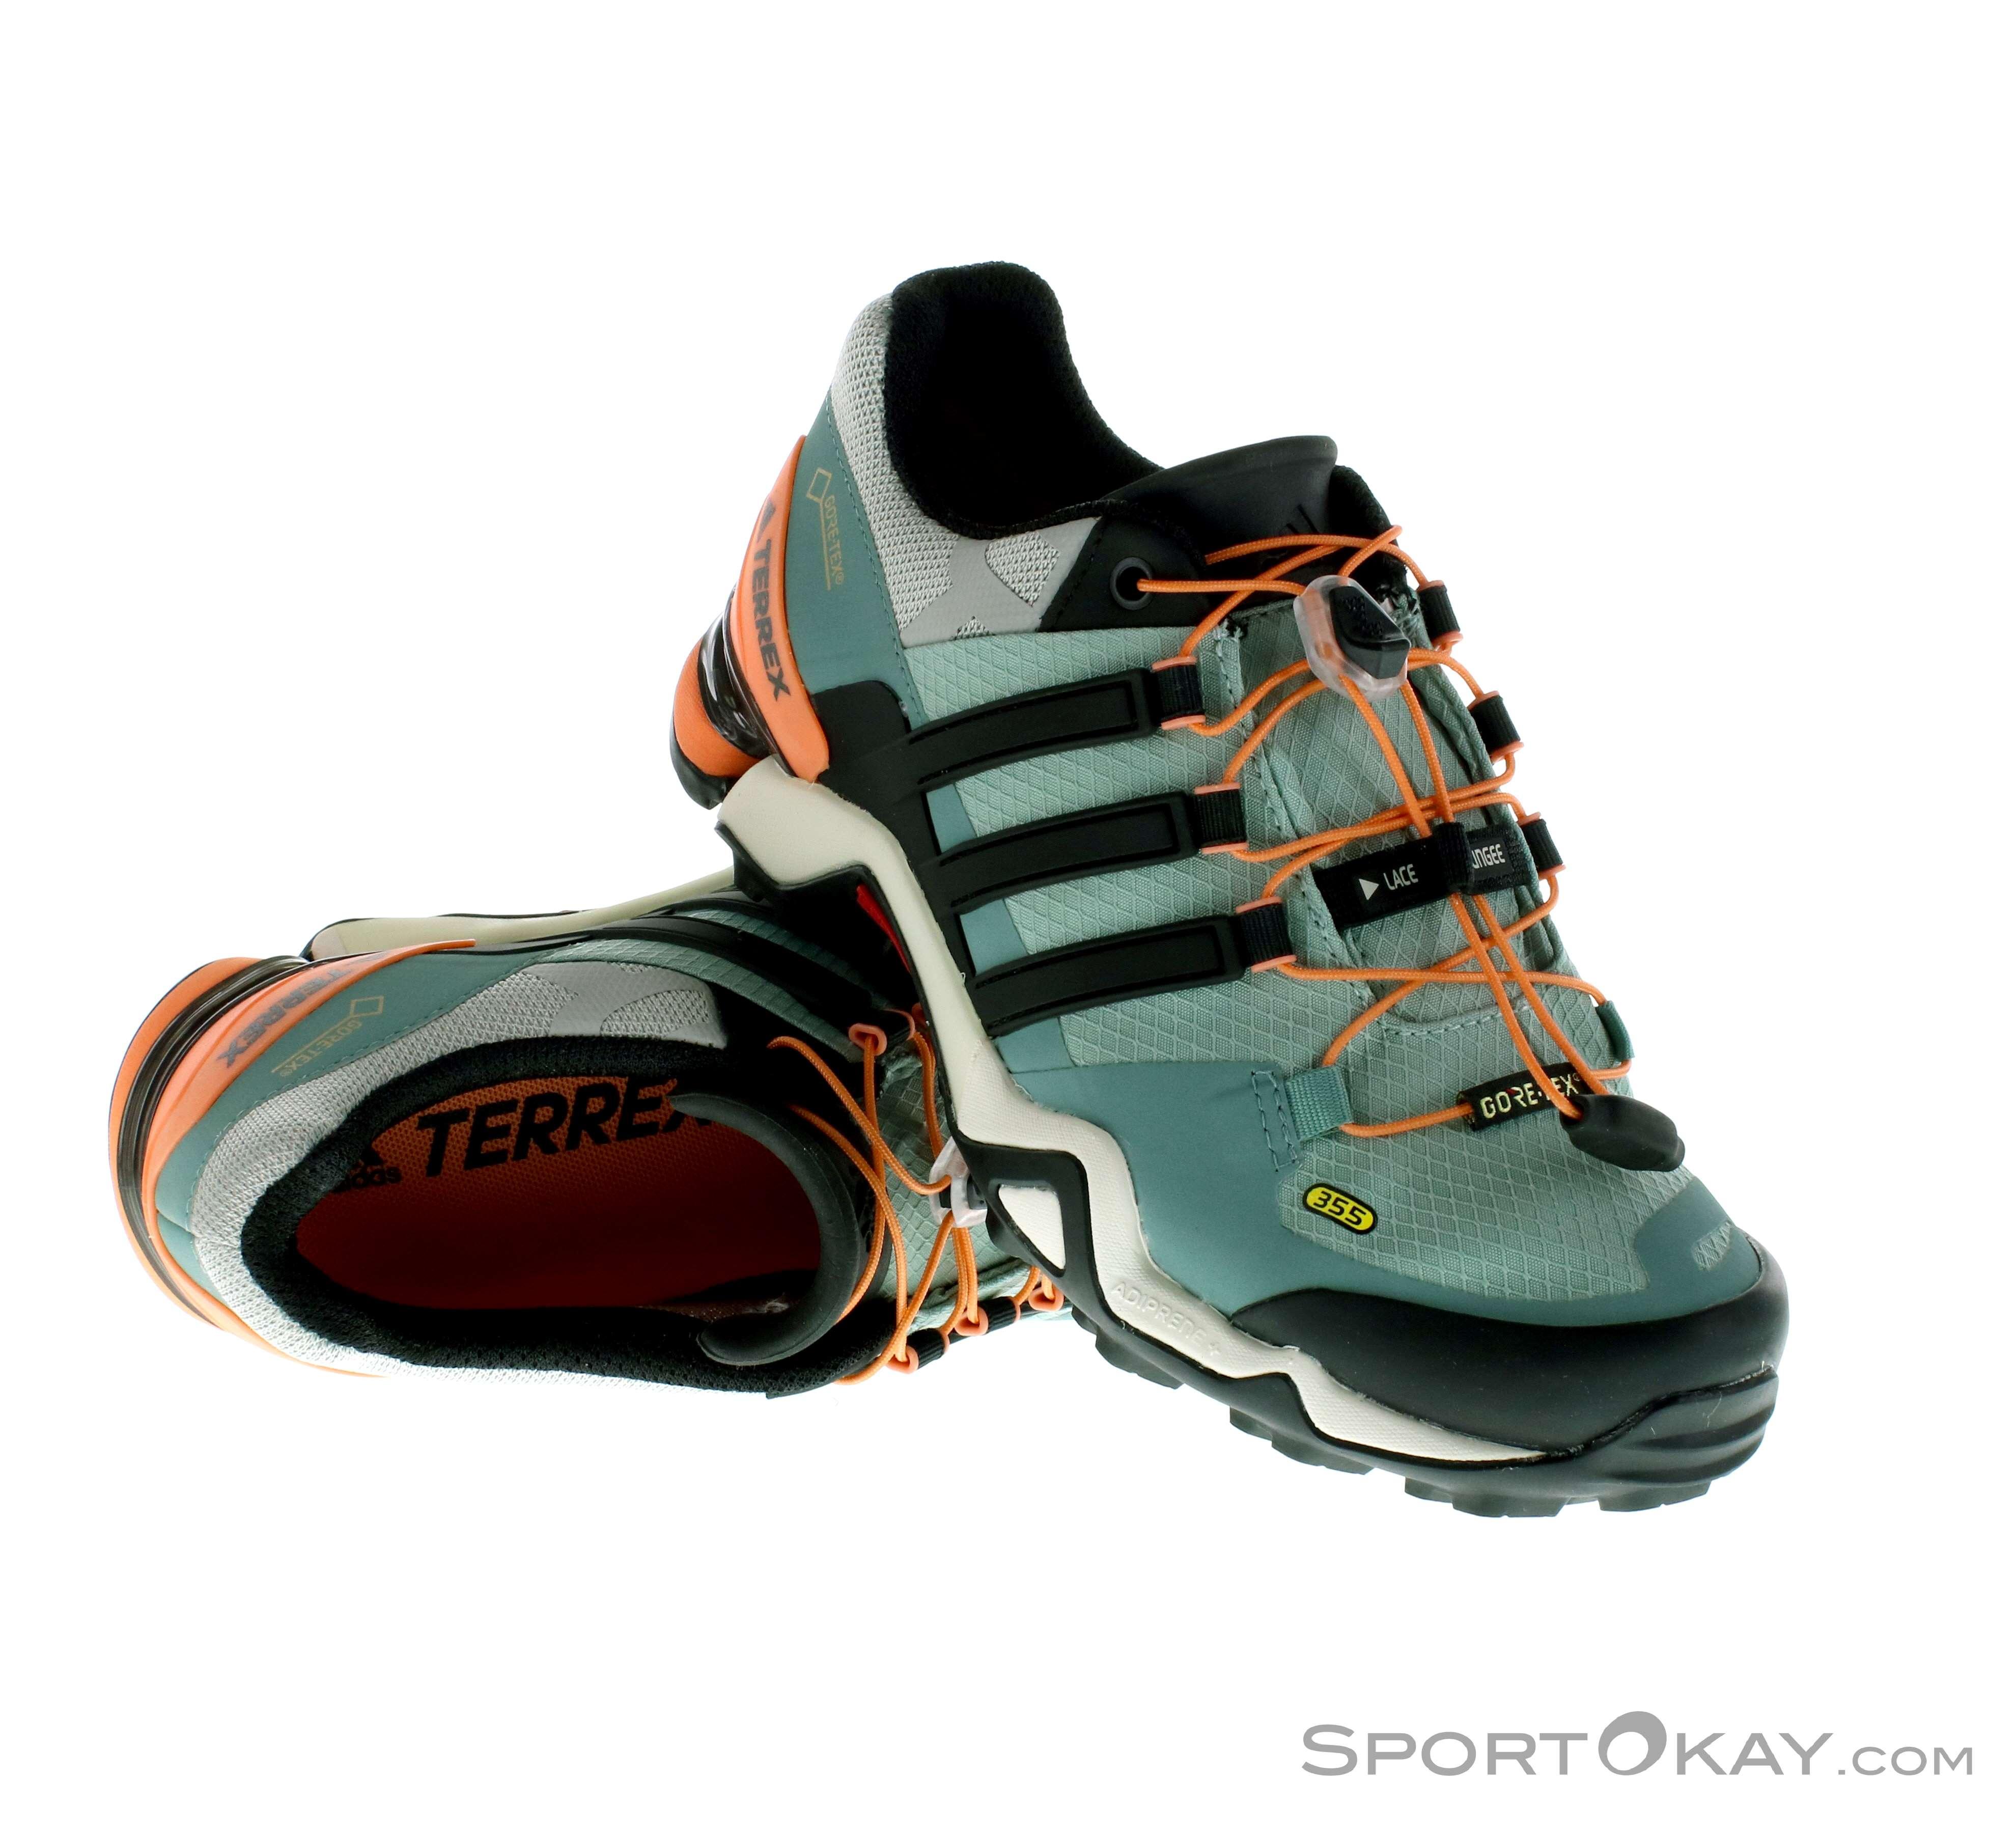 f6838b708 adidas Terrex Fast R Womens GTX Trekking Shoes Gore-Tex - Trekking ...